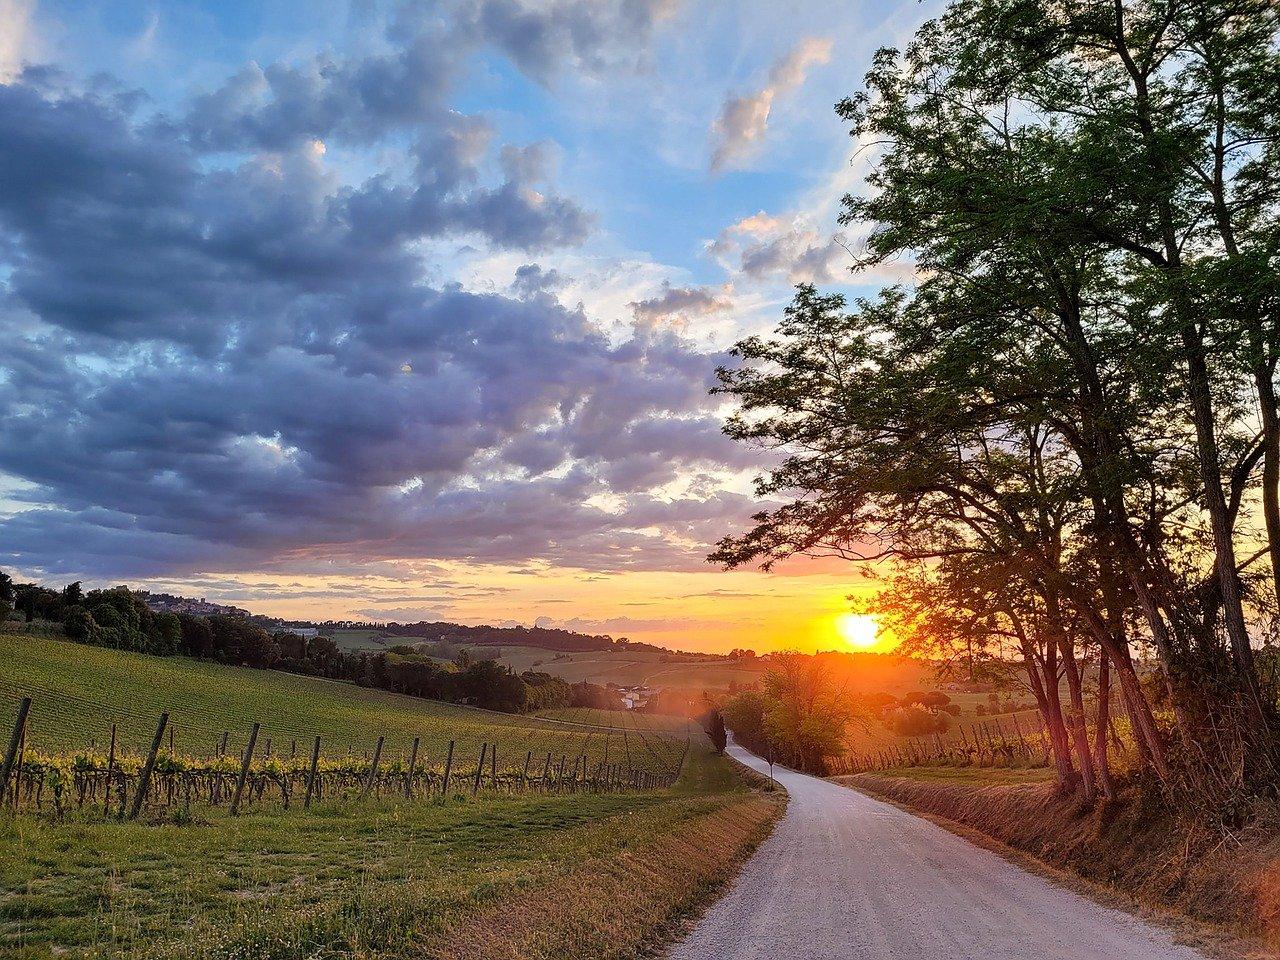 sunset-6257343_1280